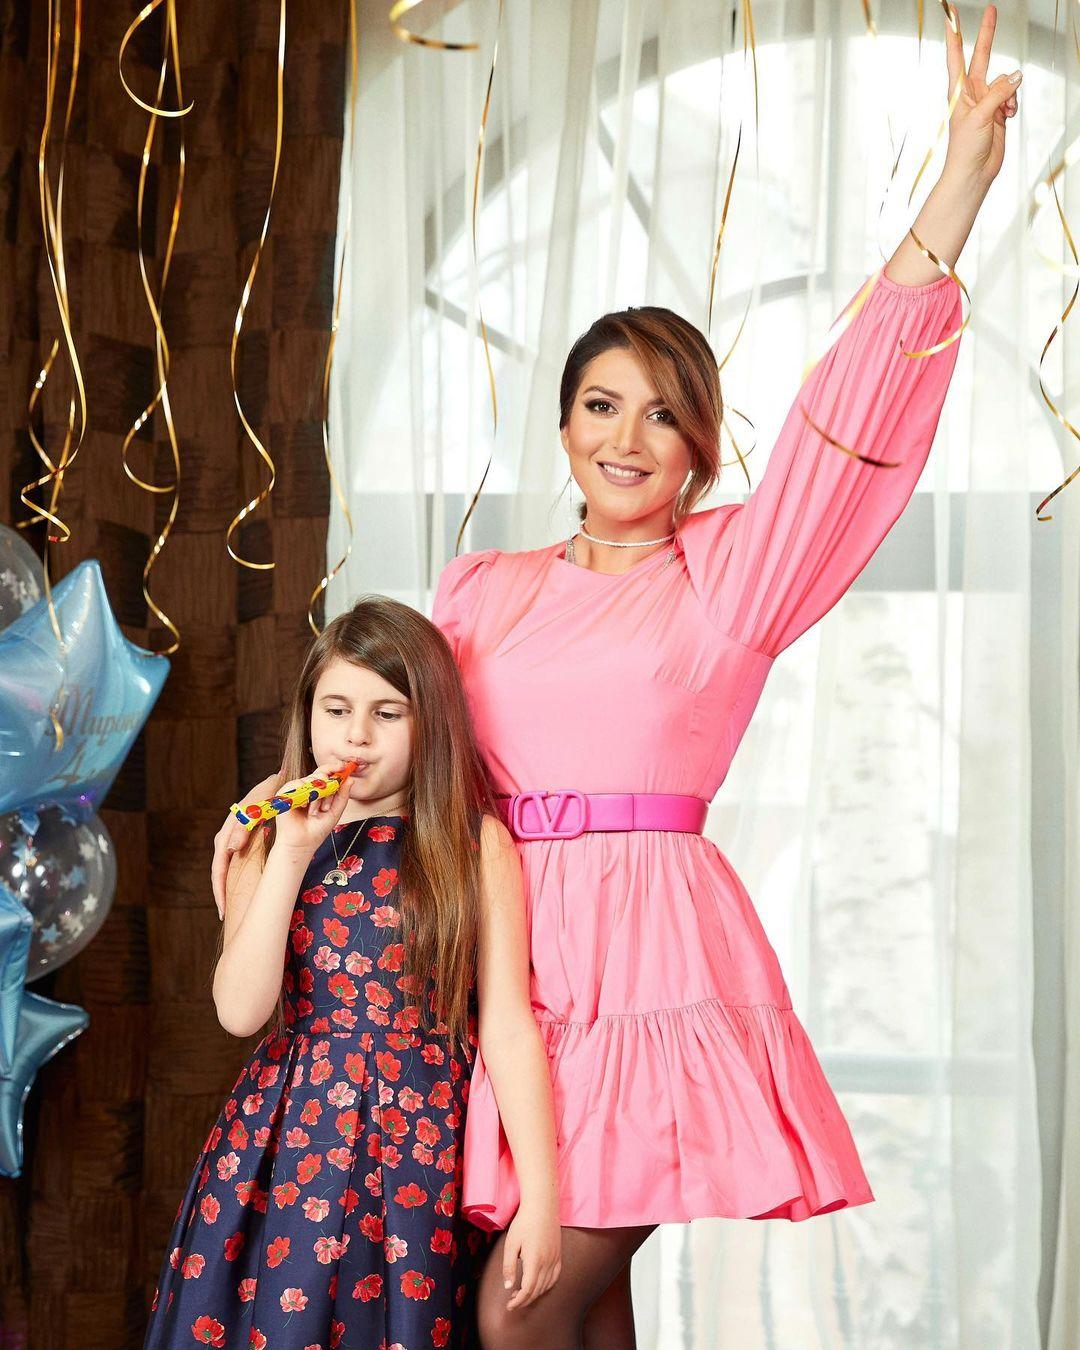 Дочка Жасмин дебютировала на модном показе